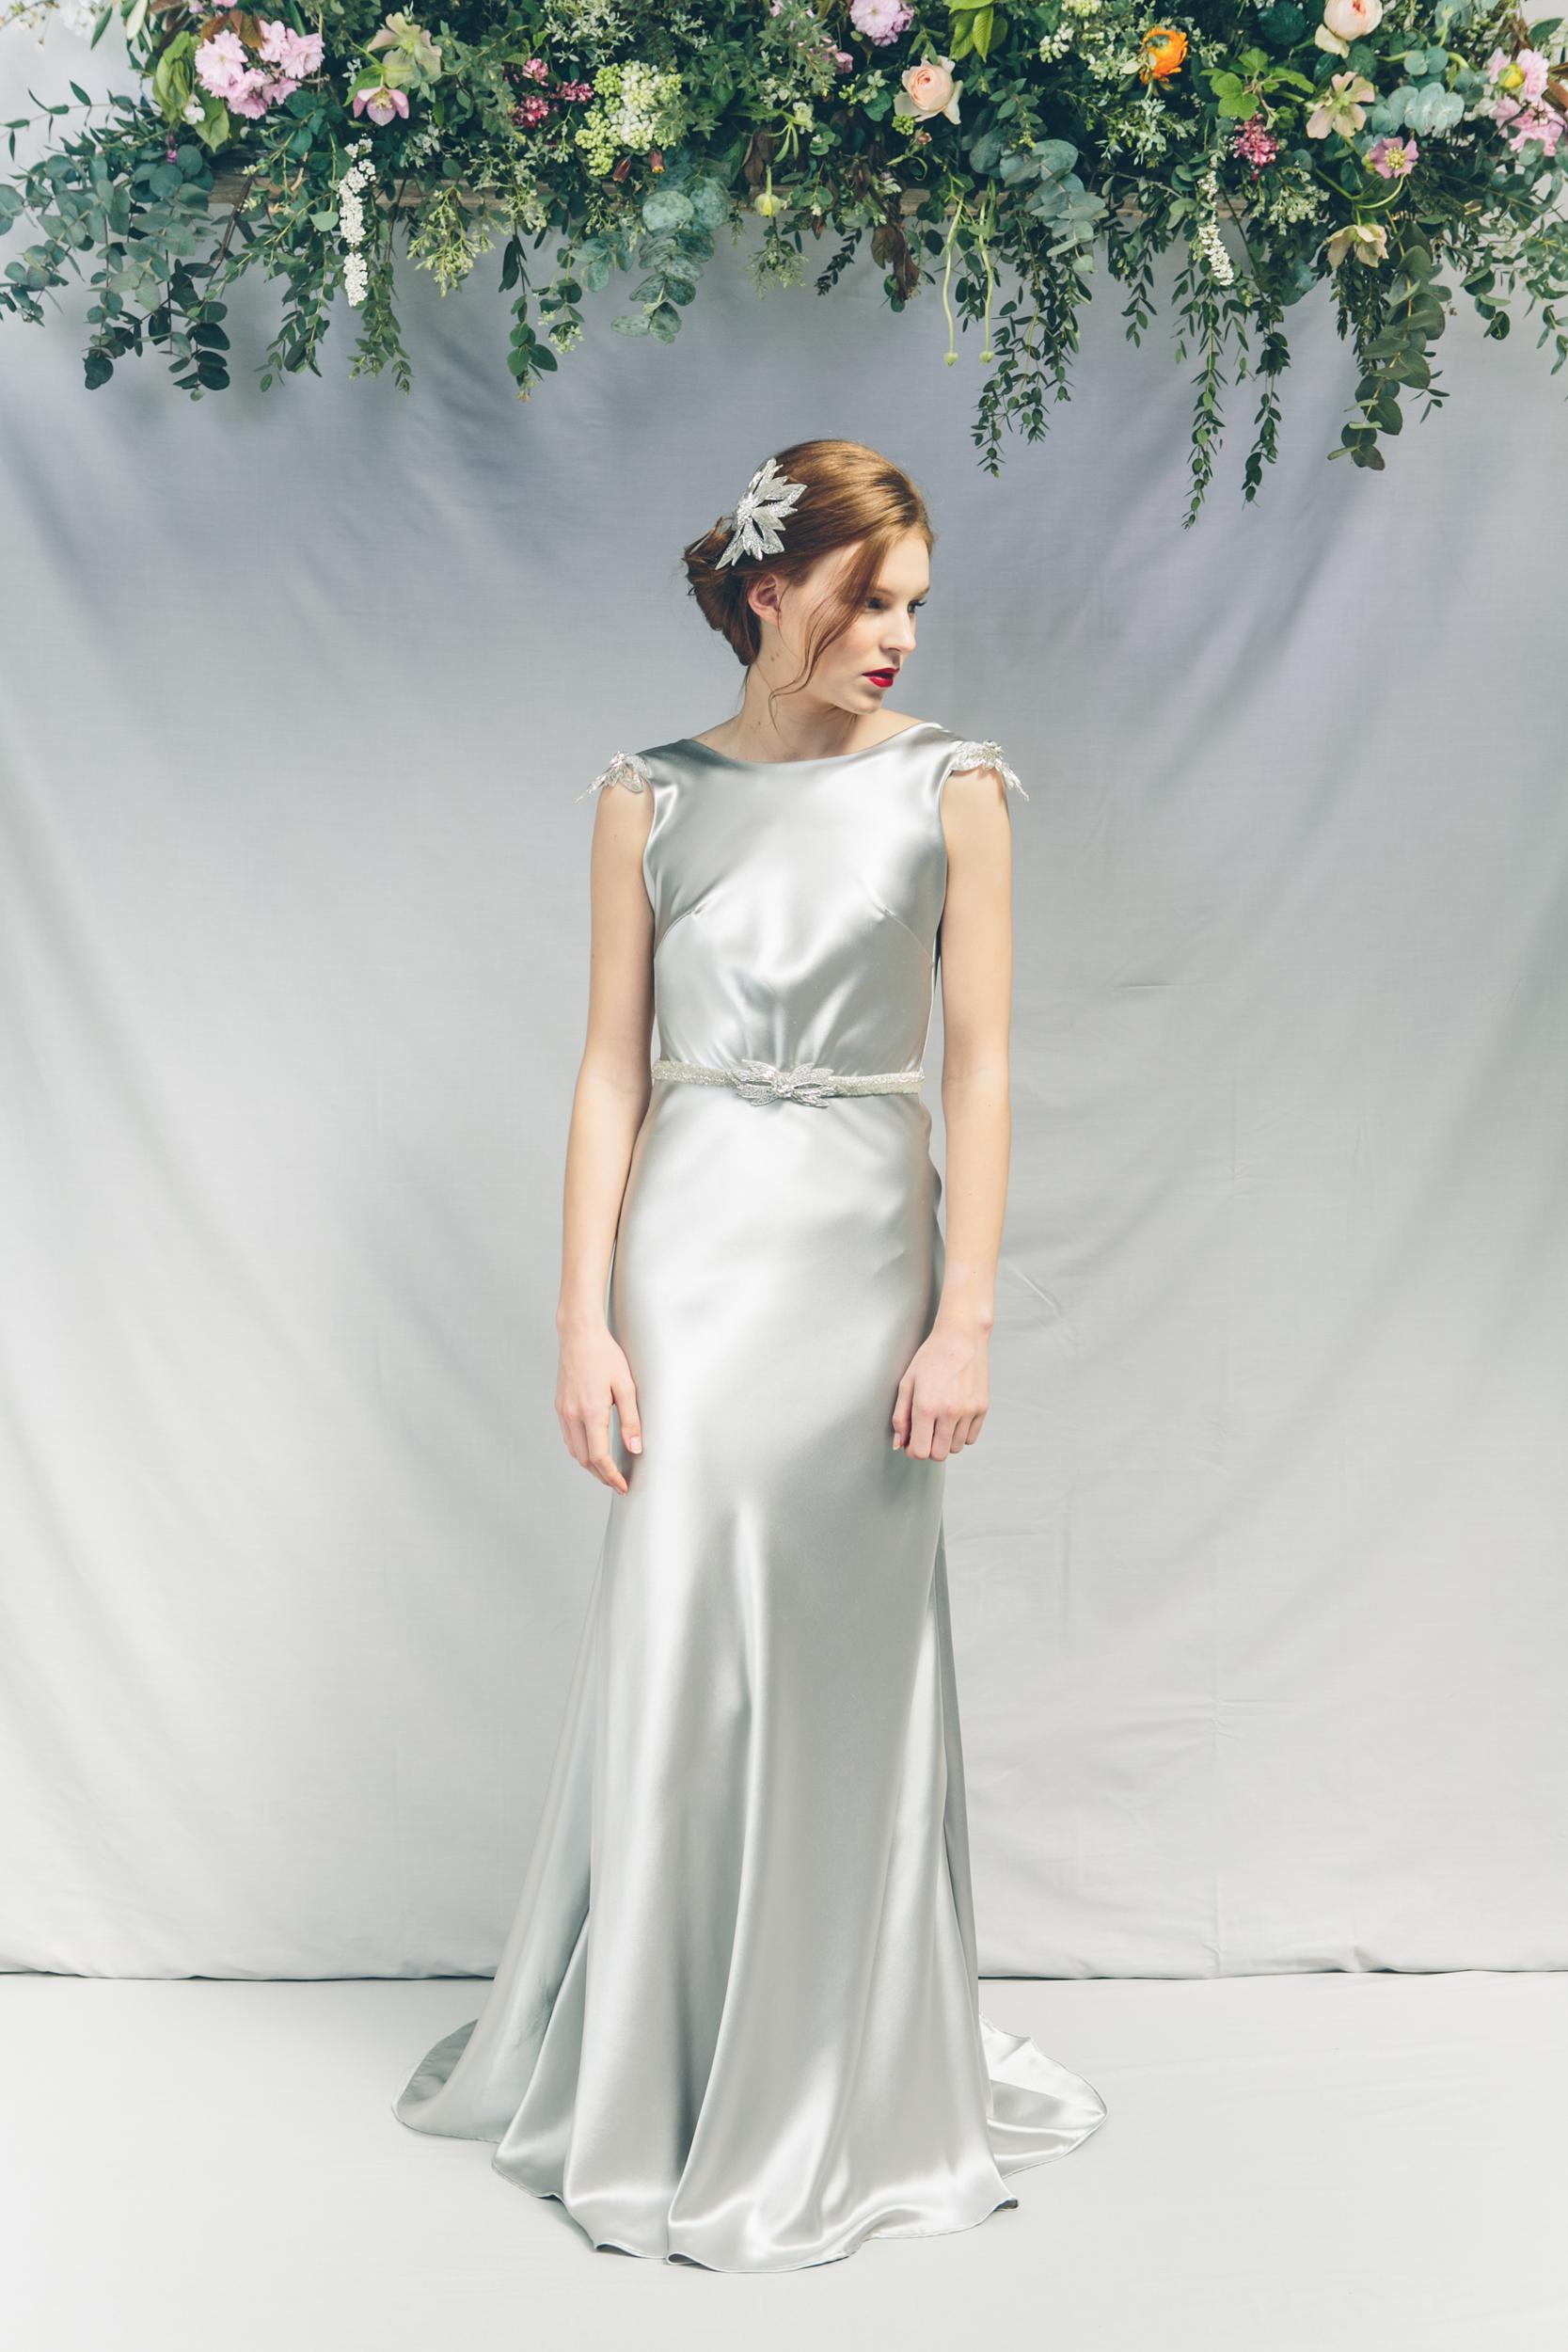 Kate-Beaumont-Wedding-Dresses-Sheffield-30.jpg